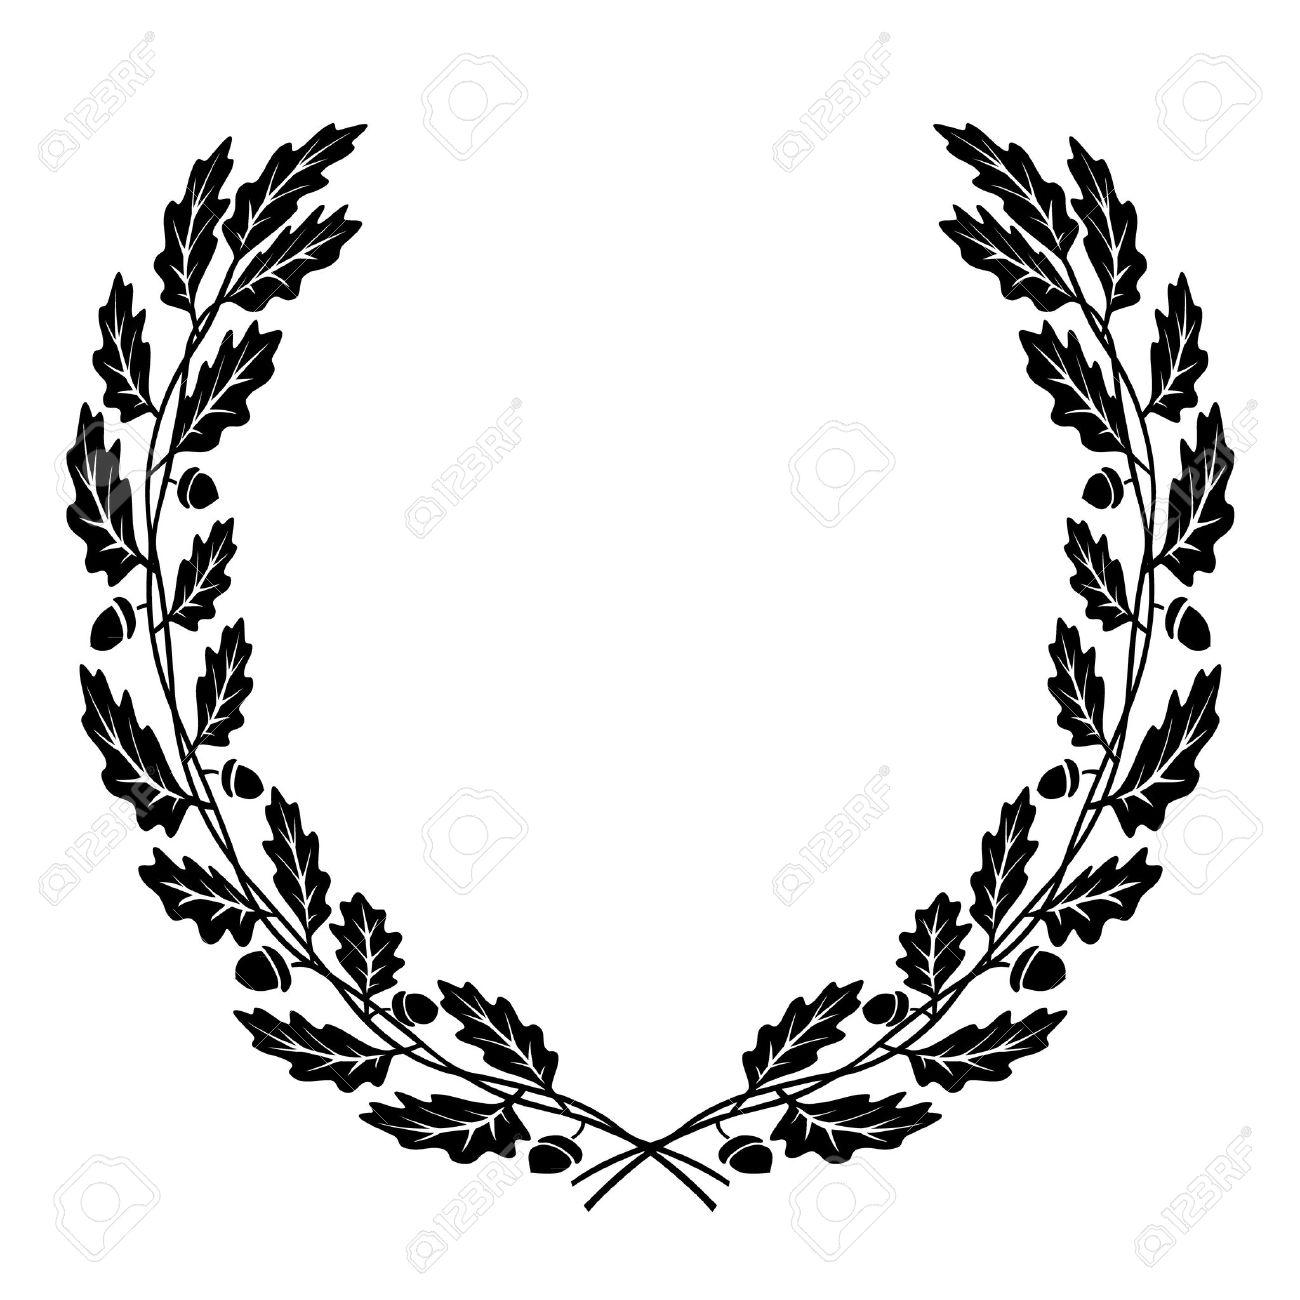 vector wreath of oak leaves black silhouette royalty free cliparts rh 123rf com oak leaf vectorial oak leaf vector free